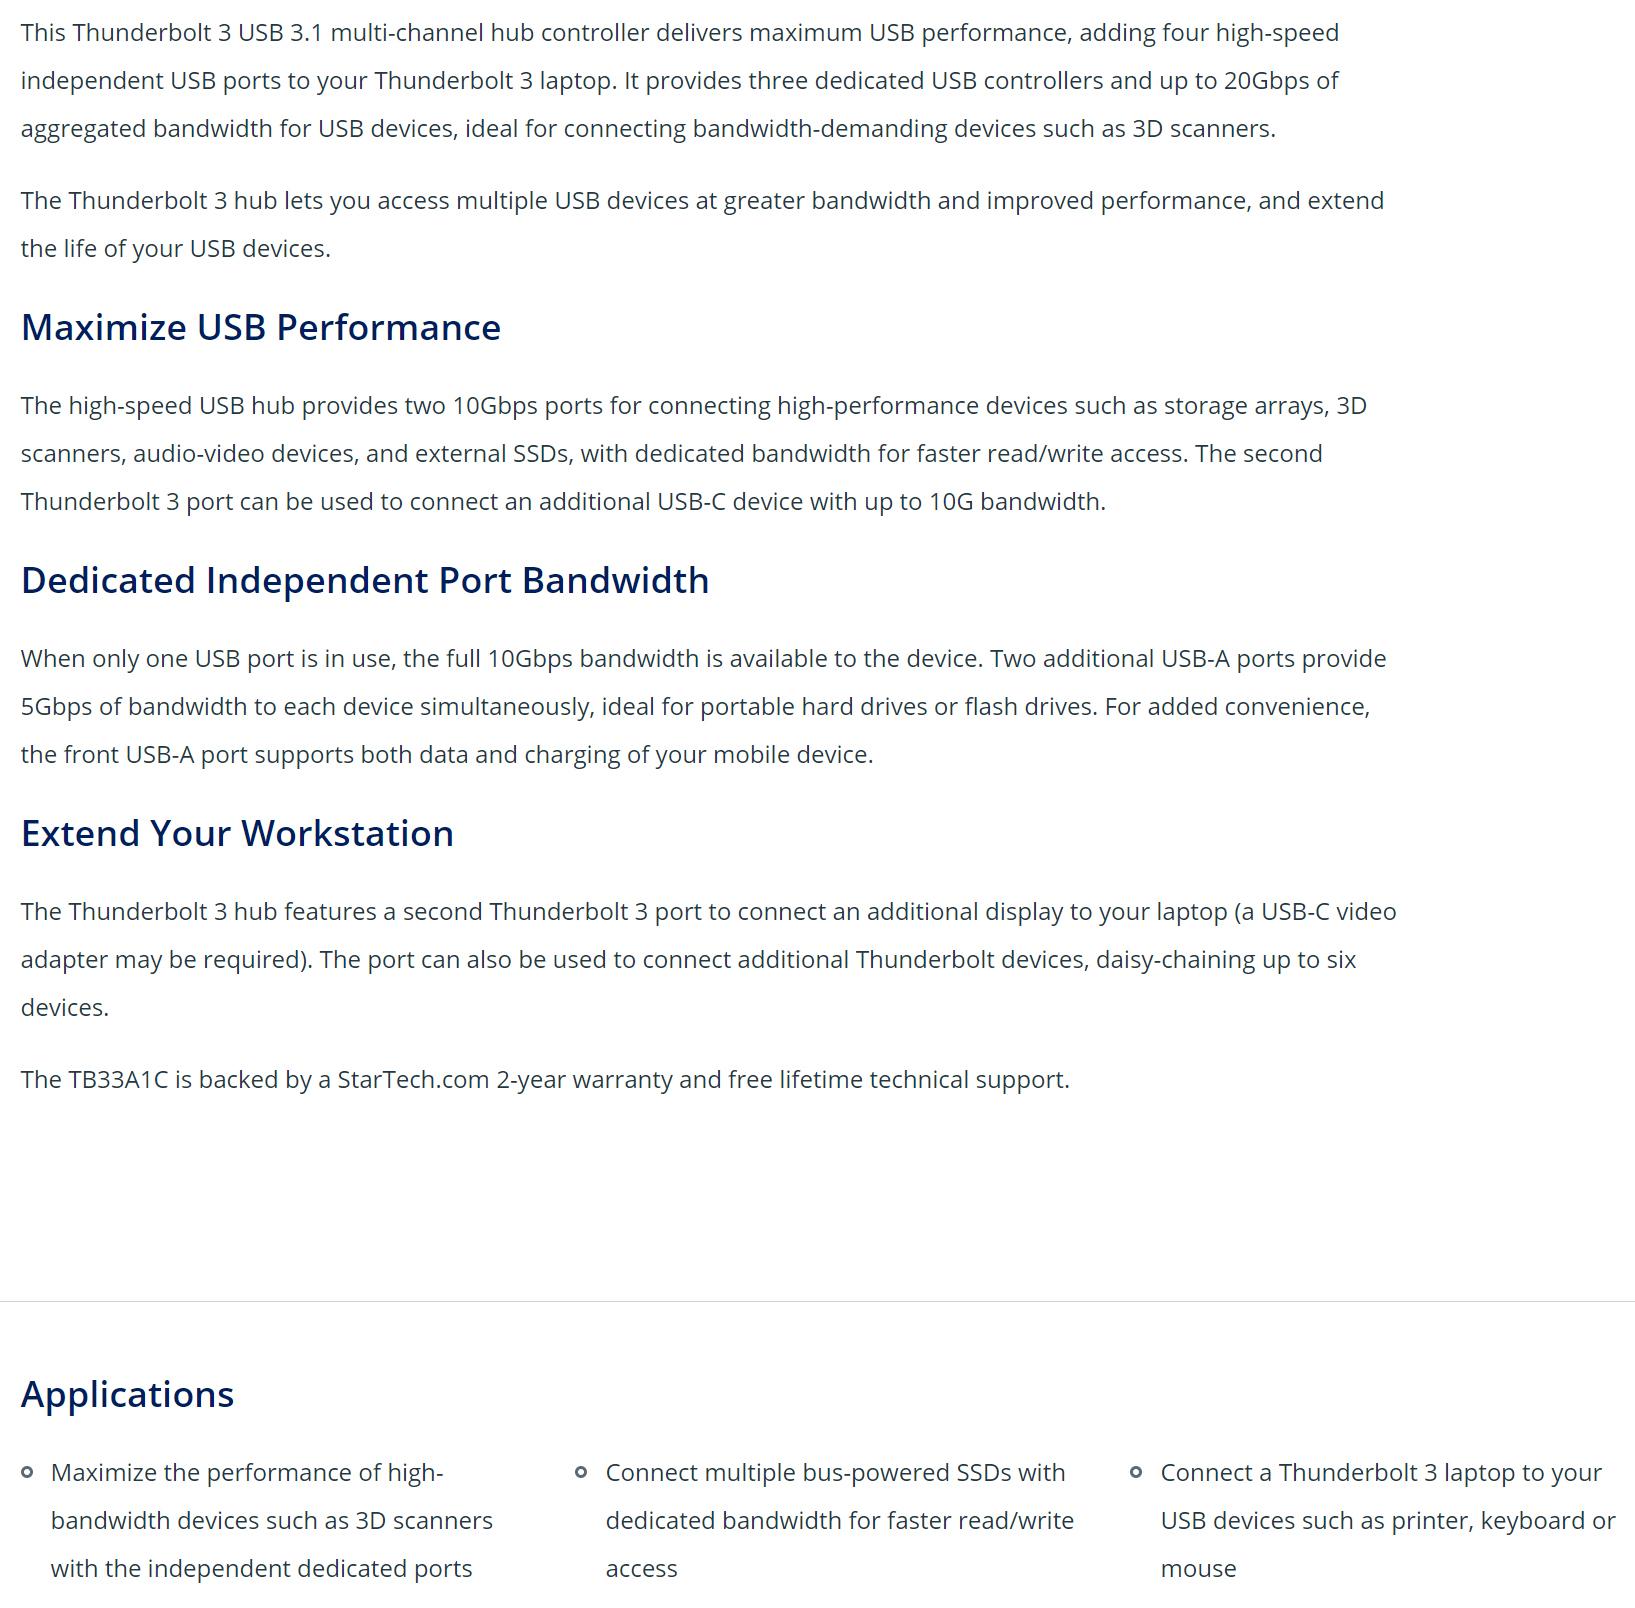 screencapture-startech-en-au-cards-adapters-tb33a1c-2021-07-09-15_02_23.jpg